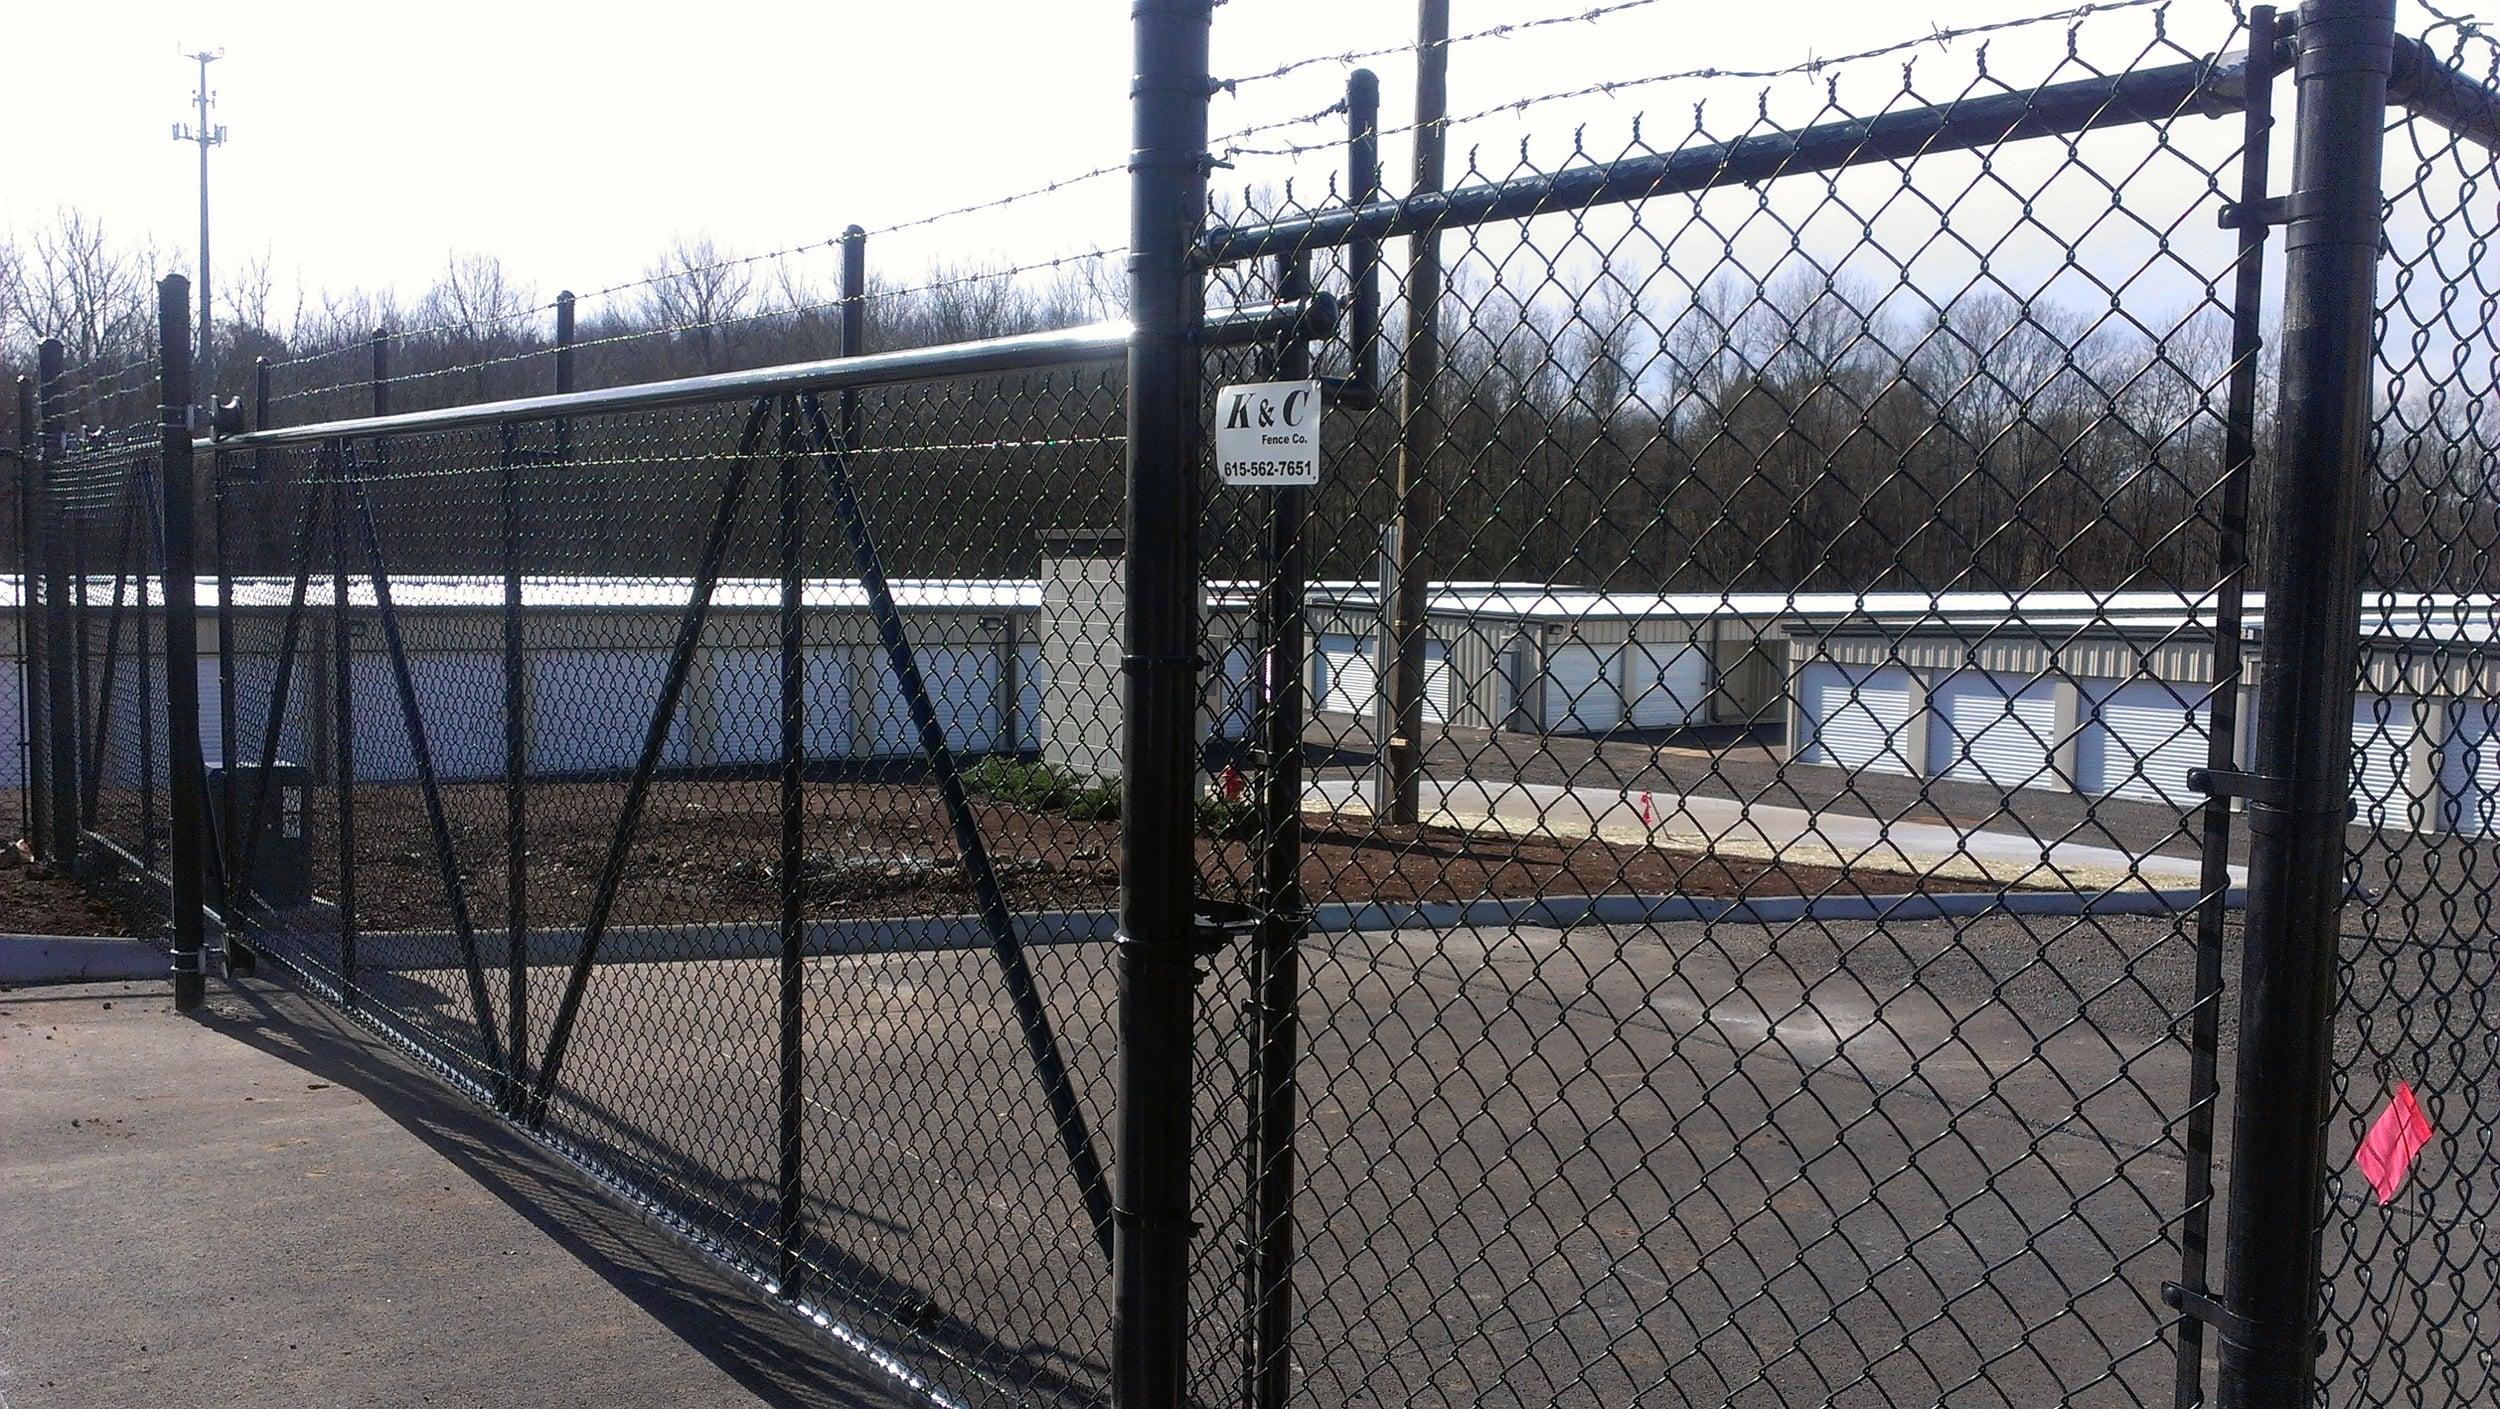 Nashville Fence Contractor: K & C Fence Company